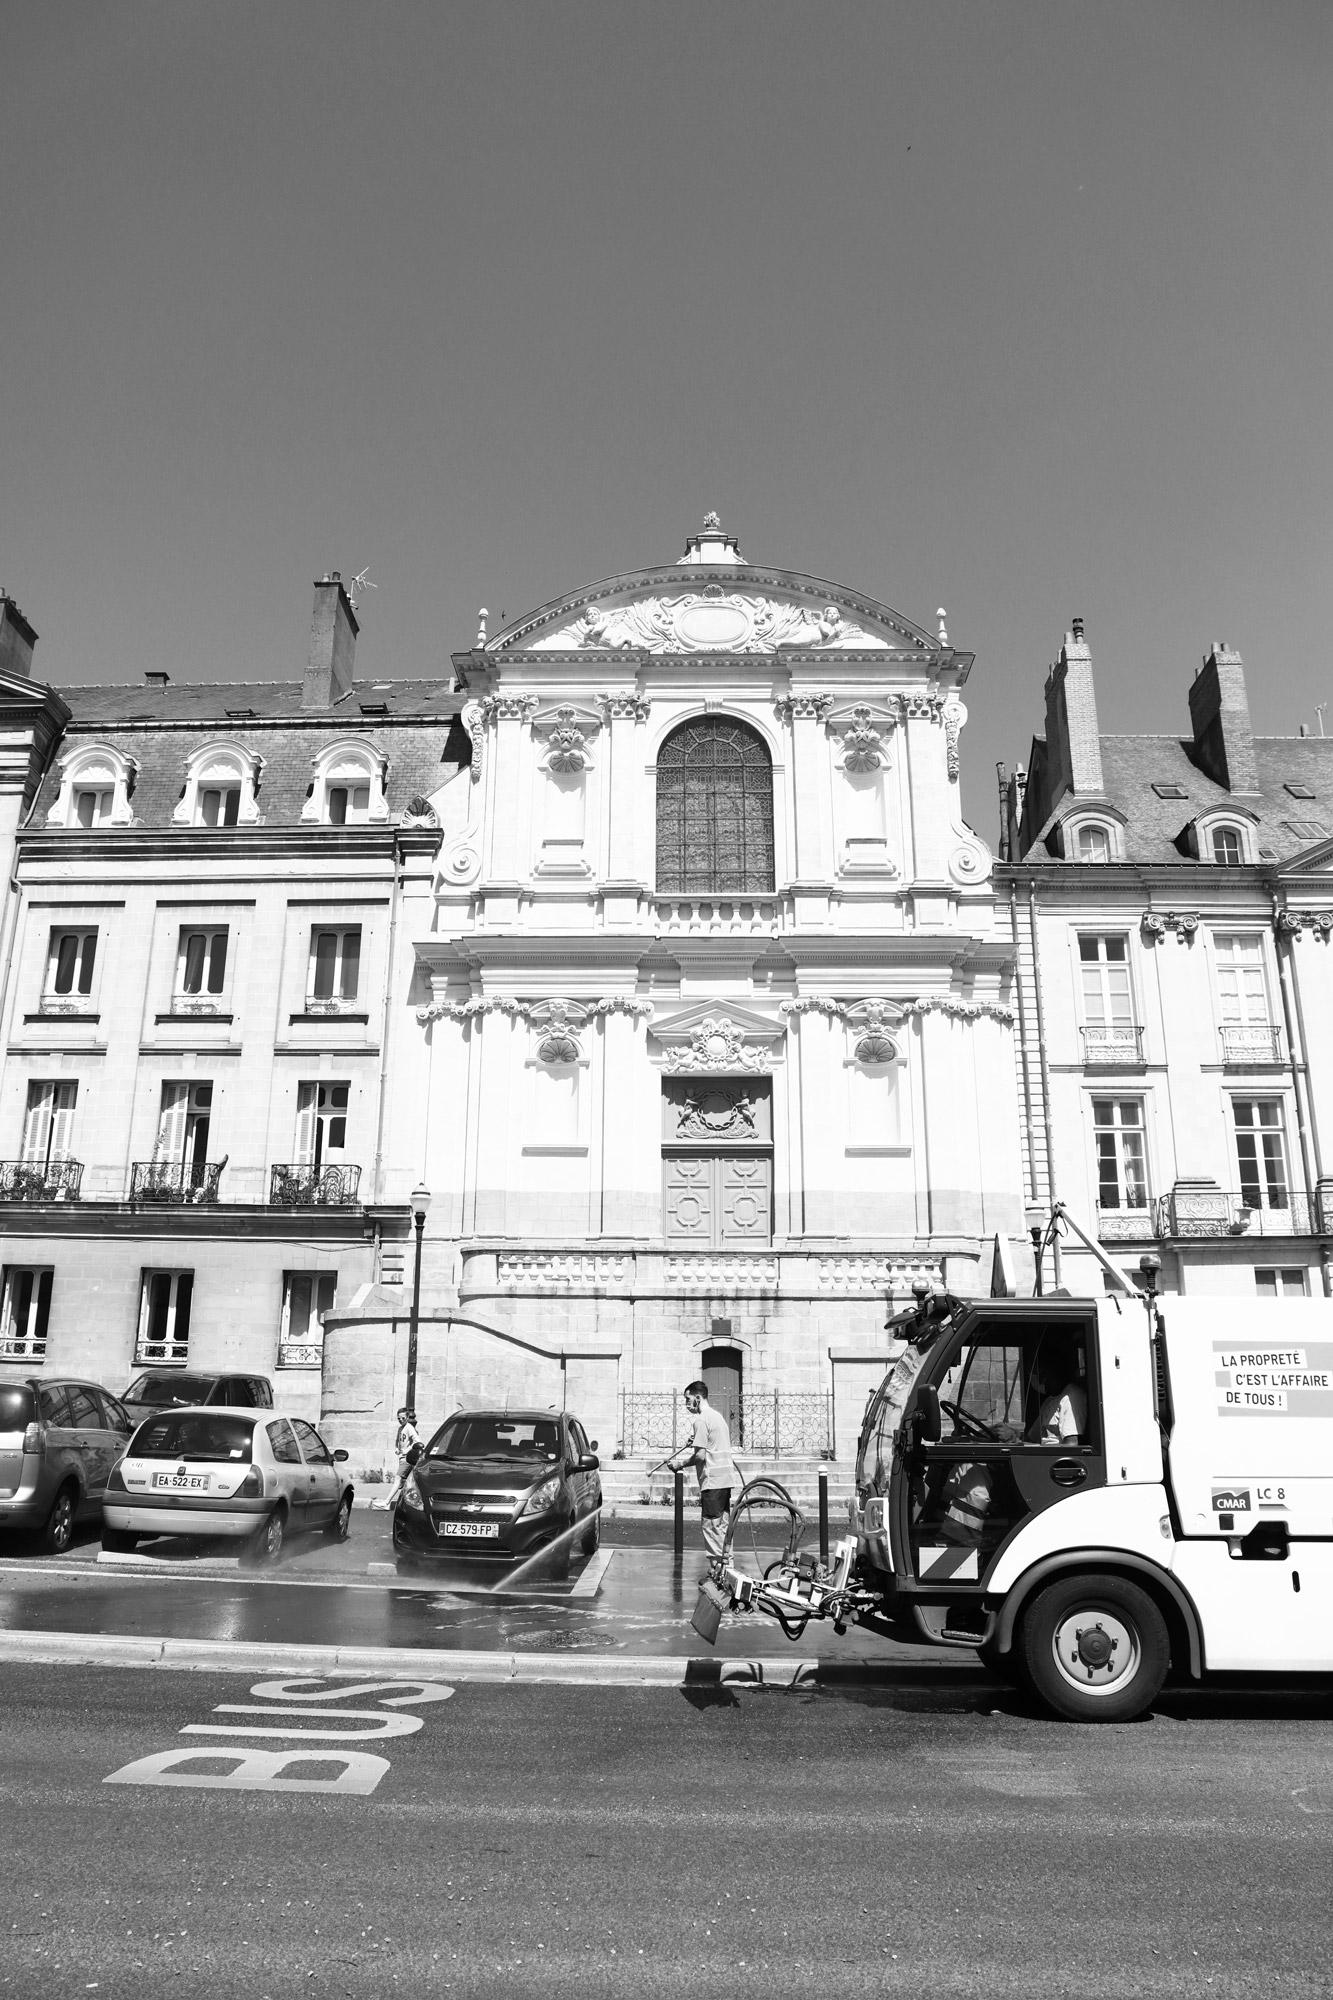 """Urban workers"" - Rue Henri IV, Nantes. ©Clémence Rougetet"